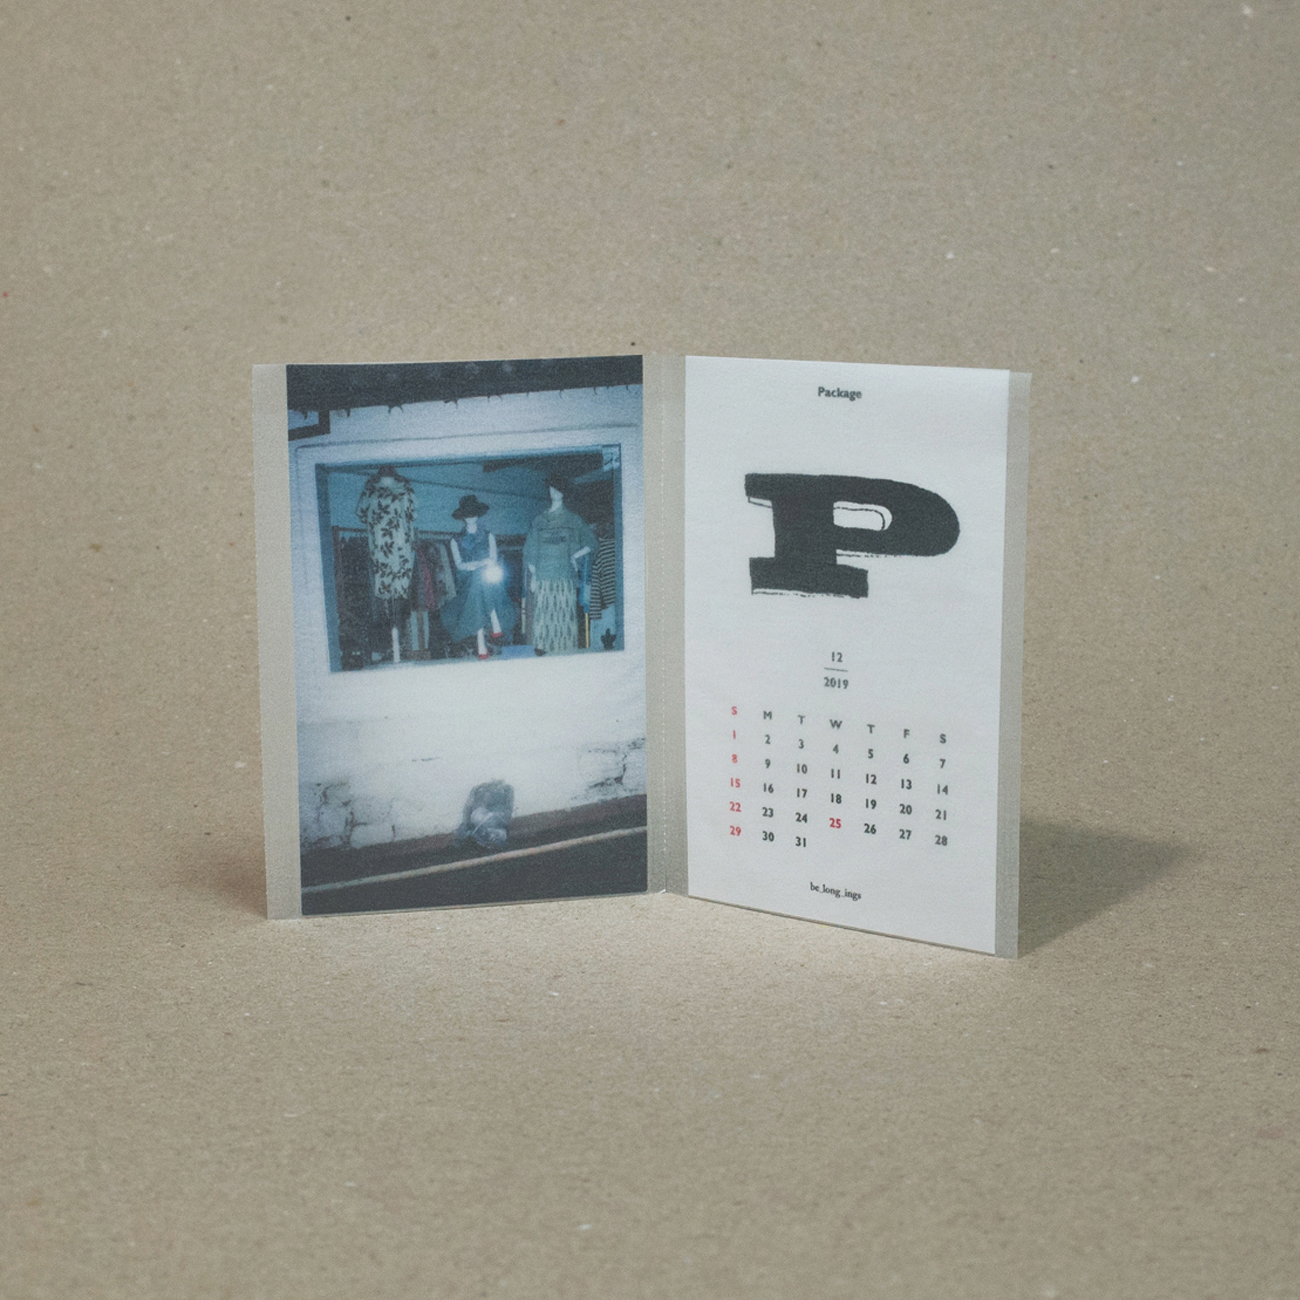 A Piece_ 84 x 114mm  / A Spread_170 x 114mm, Mojo 220g with Powder paper